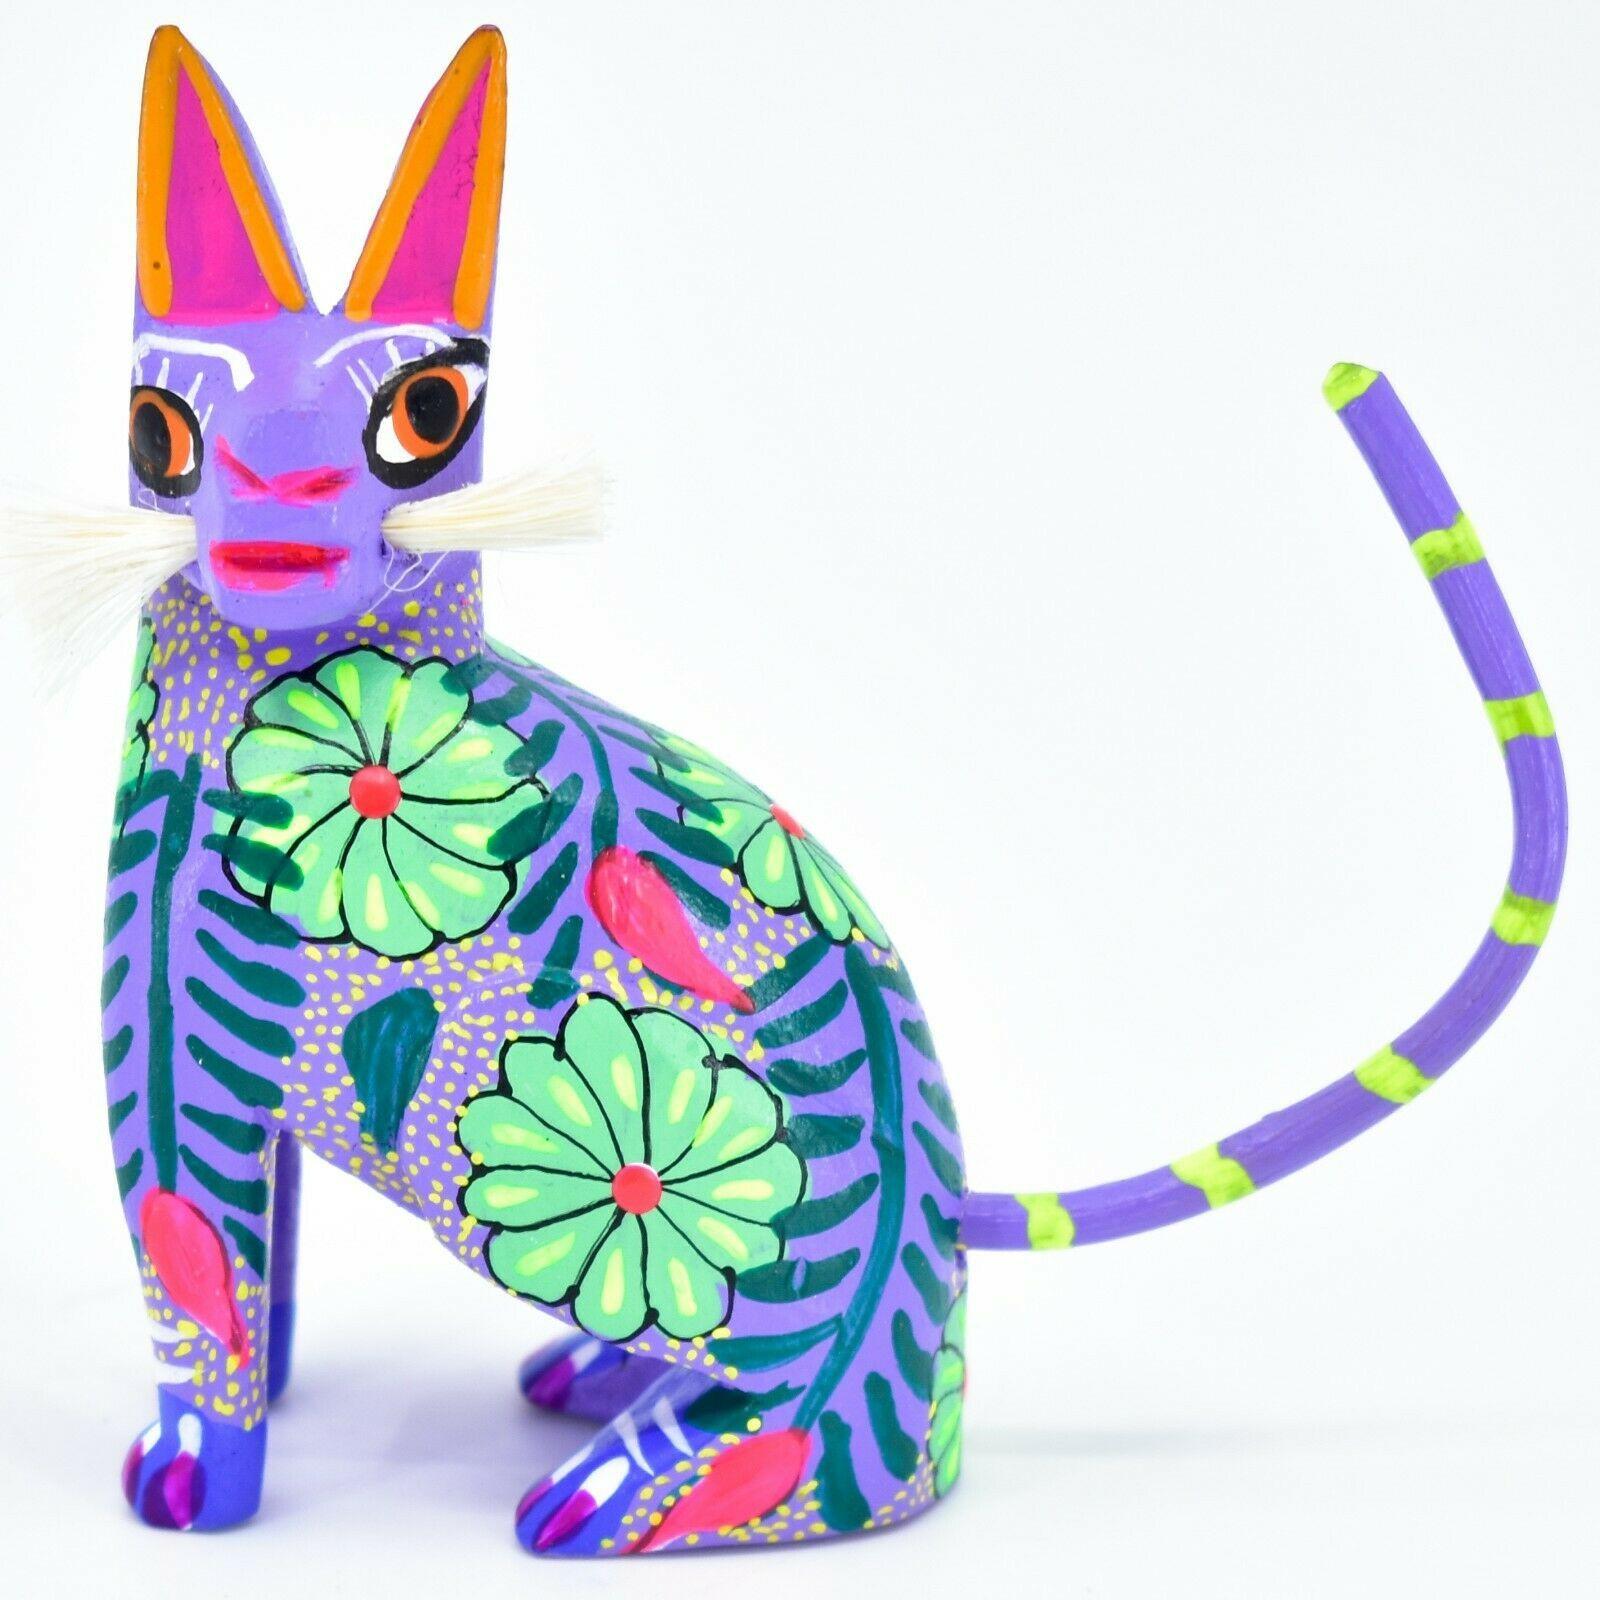 Handmade Alebrijes Oaxacan Wood Carved Painted Folk Art Sitting Cat Figurine